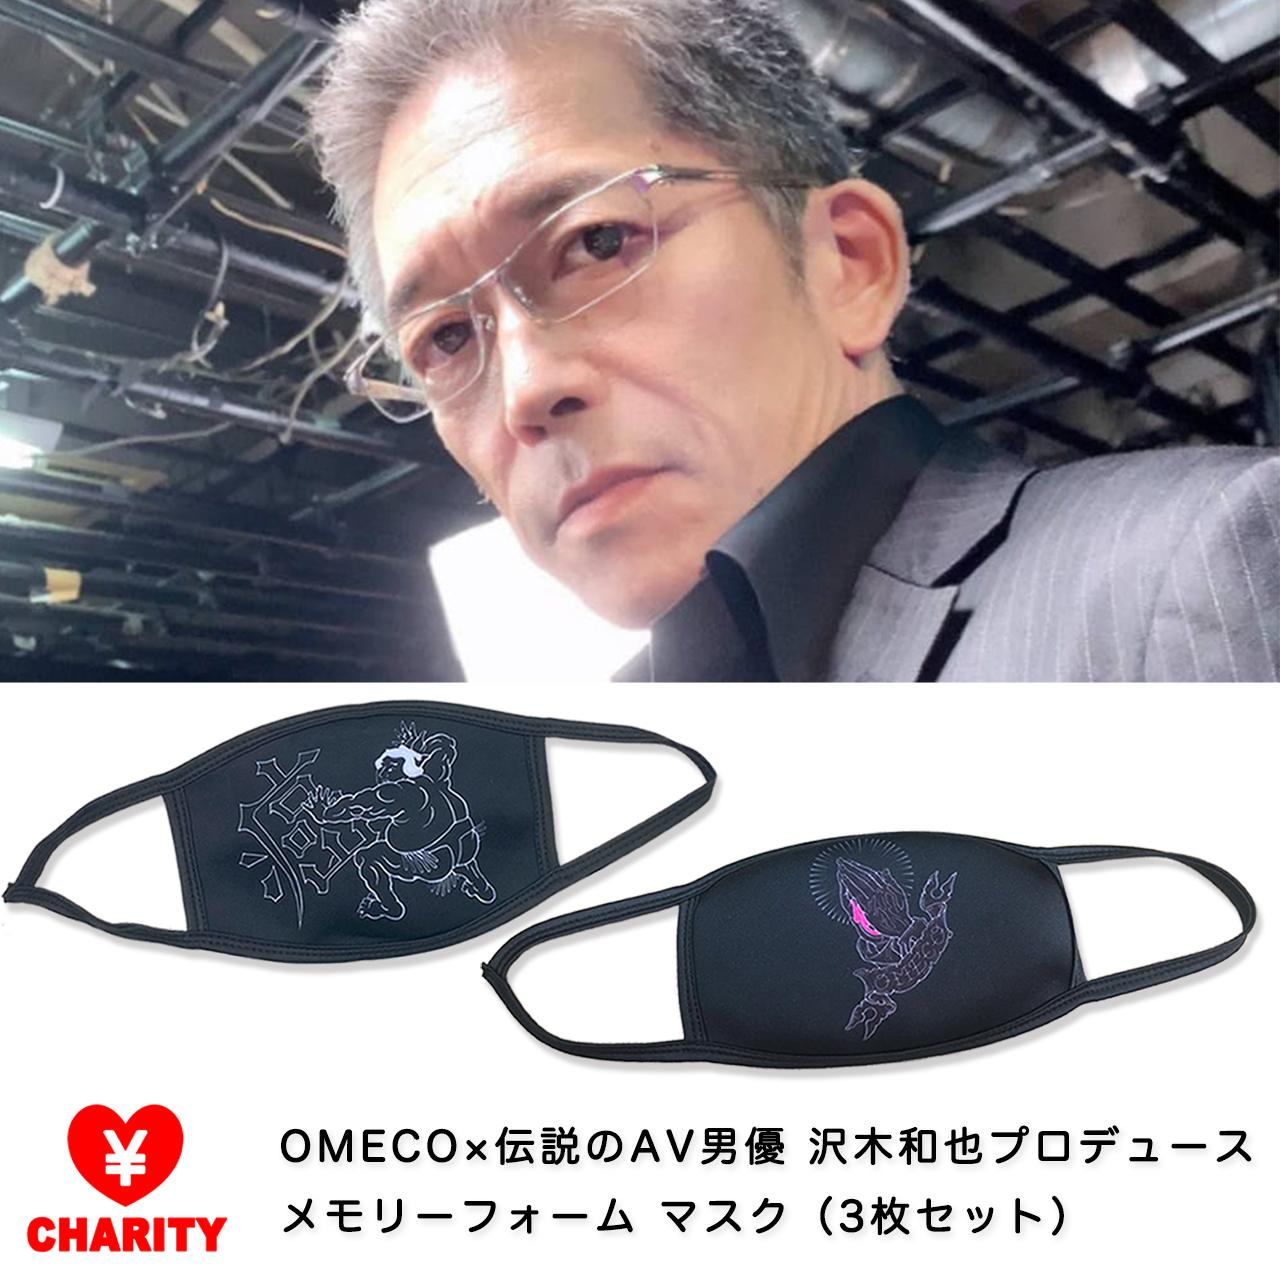 OMECO AV男優 沢木和也プロデュース メモリーフォーム マスク 3枚セット[クリックポスト配送・送料無料]